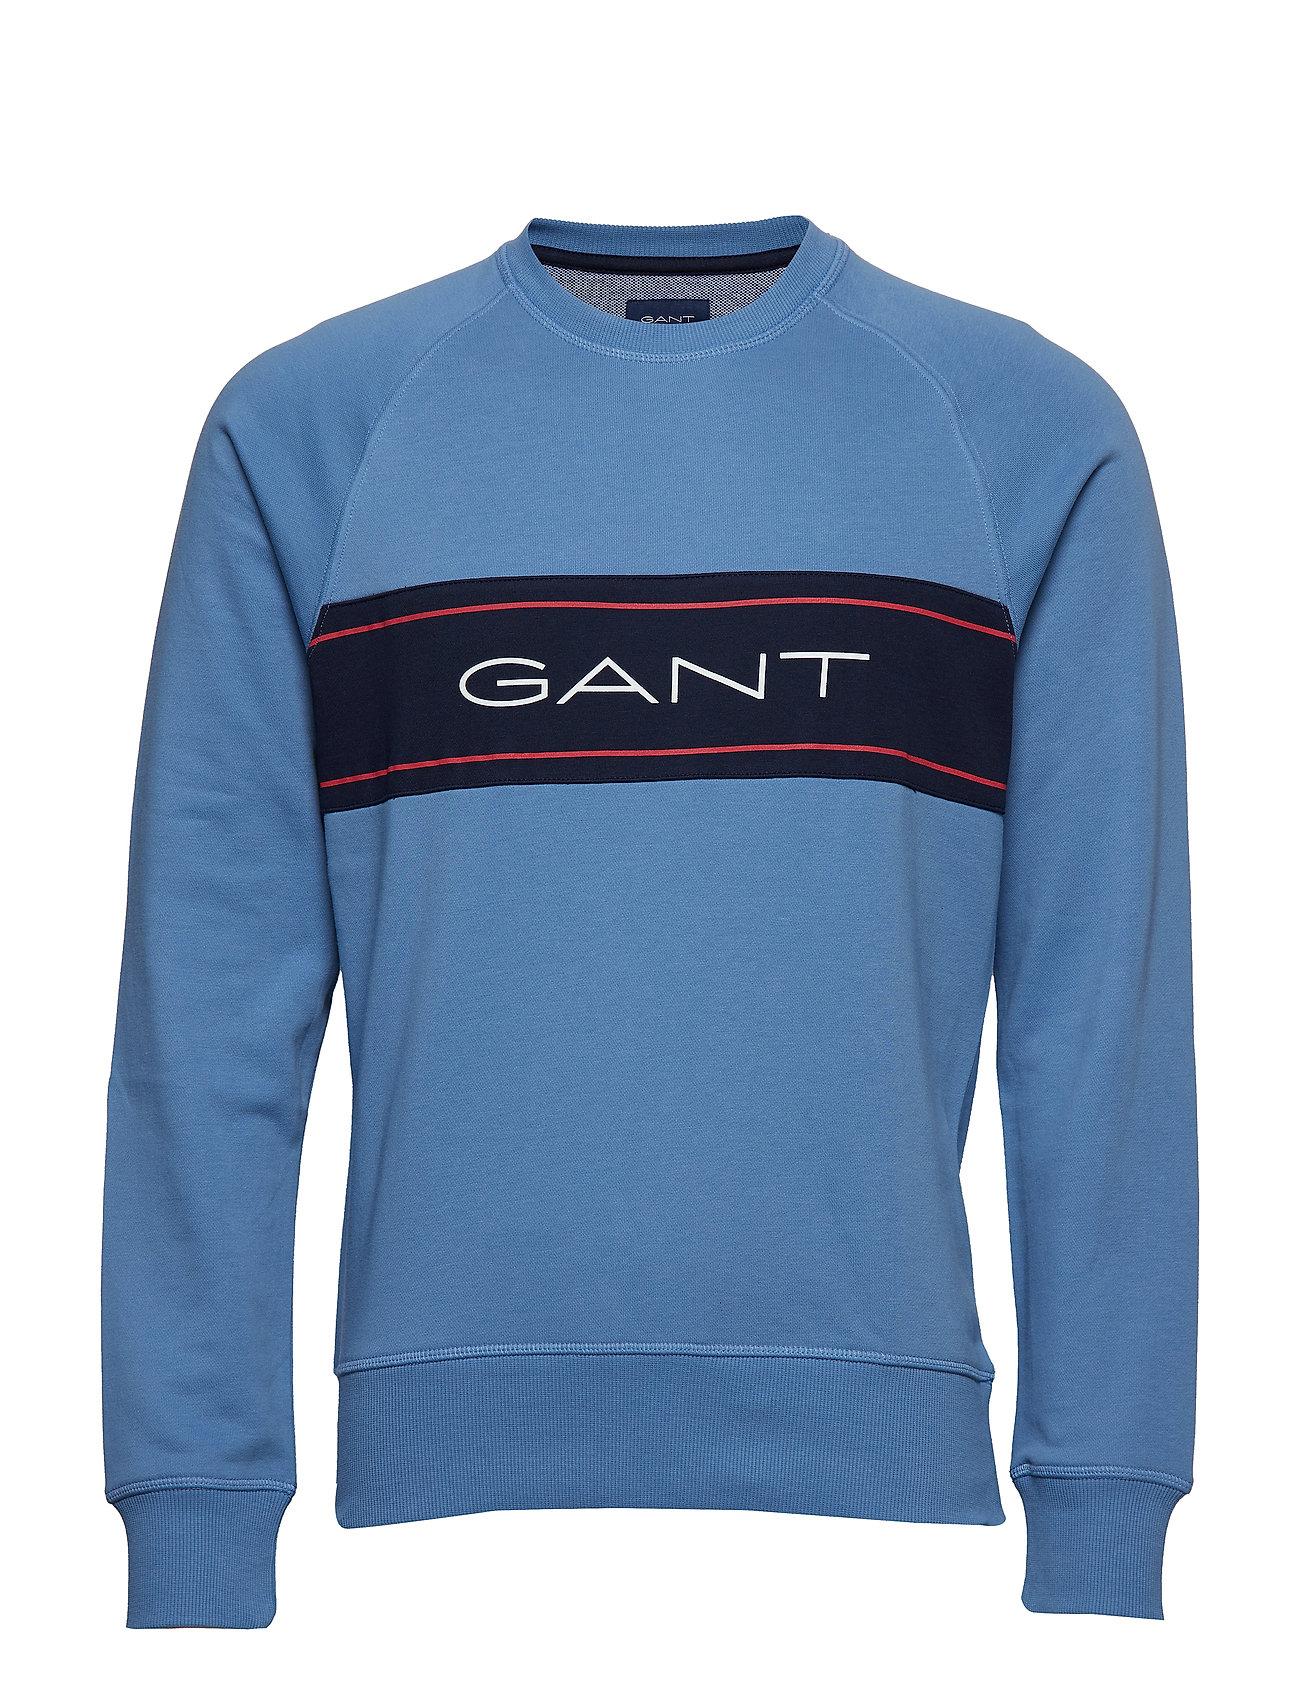 GANT O1.GANT ARCHIVE STRIPE C-NECK SWEAT - MID BLUE